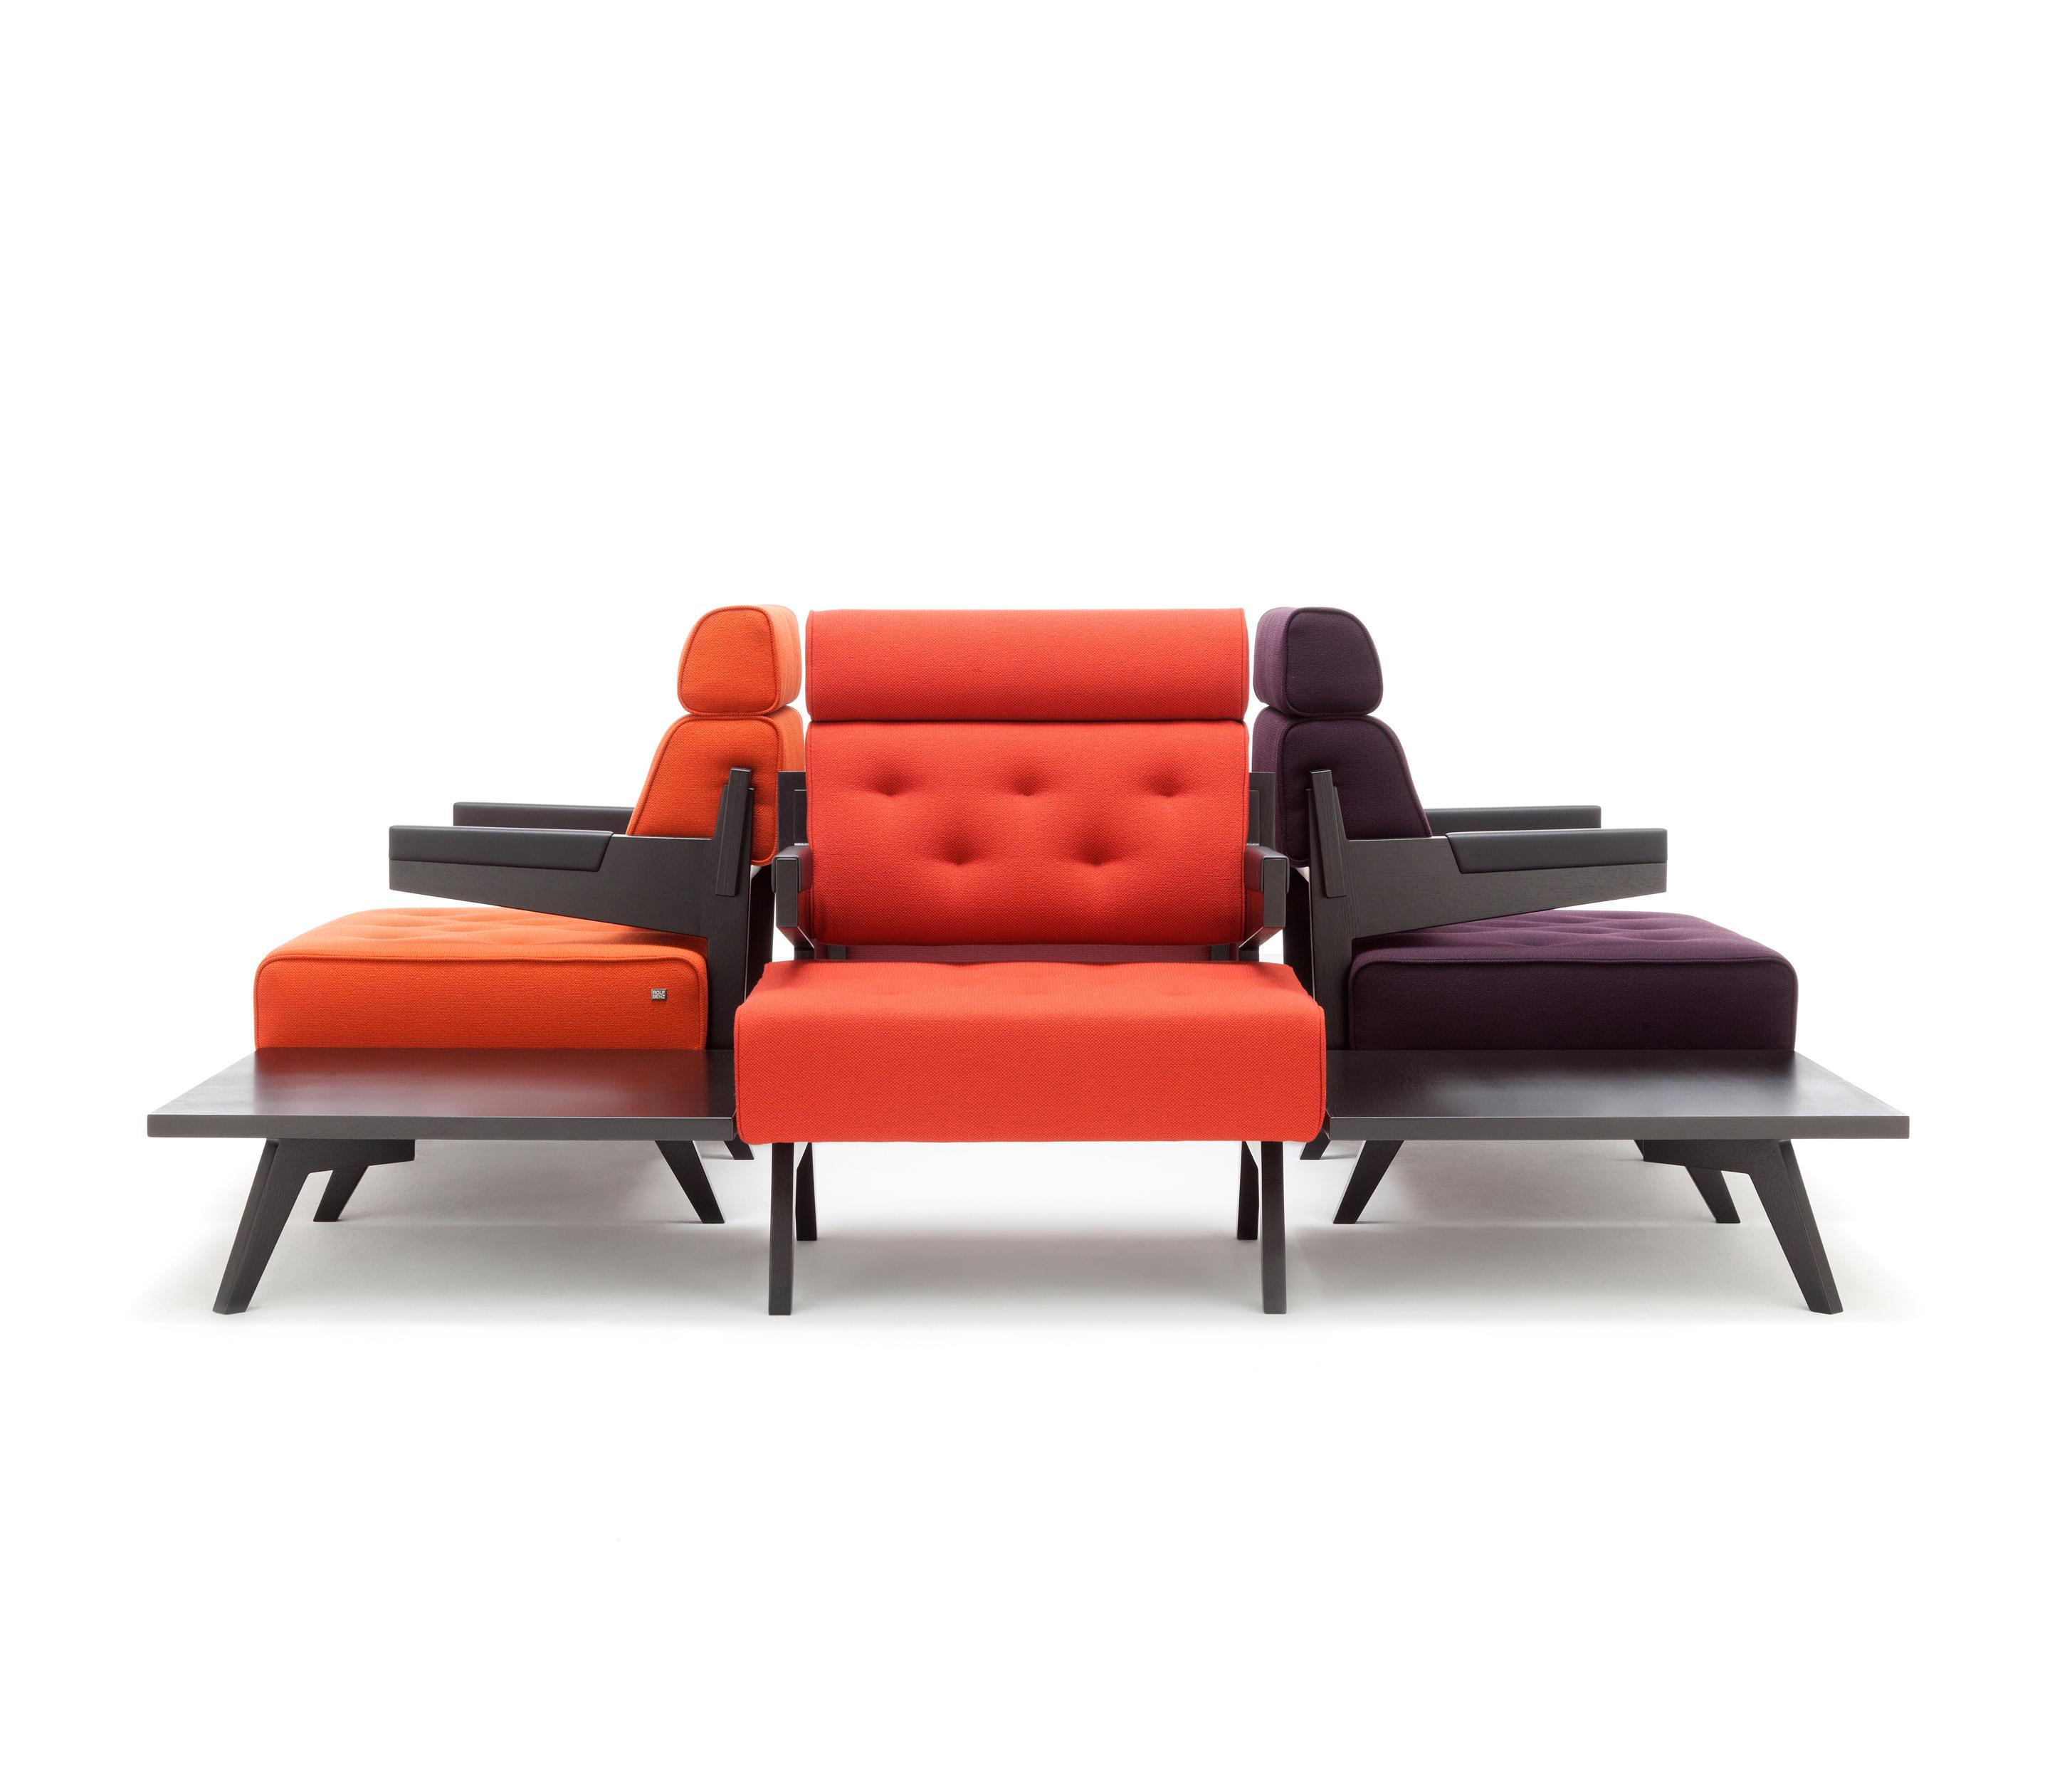 rolf benz 290 sof s de rolf benz architonic. Black Bedroom Furniture Sets. Home Design Ideas